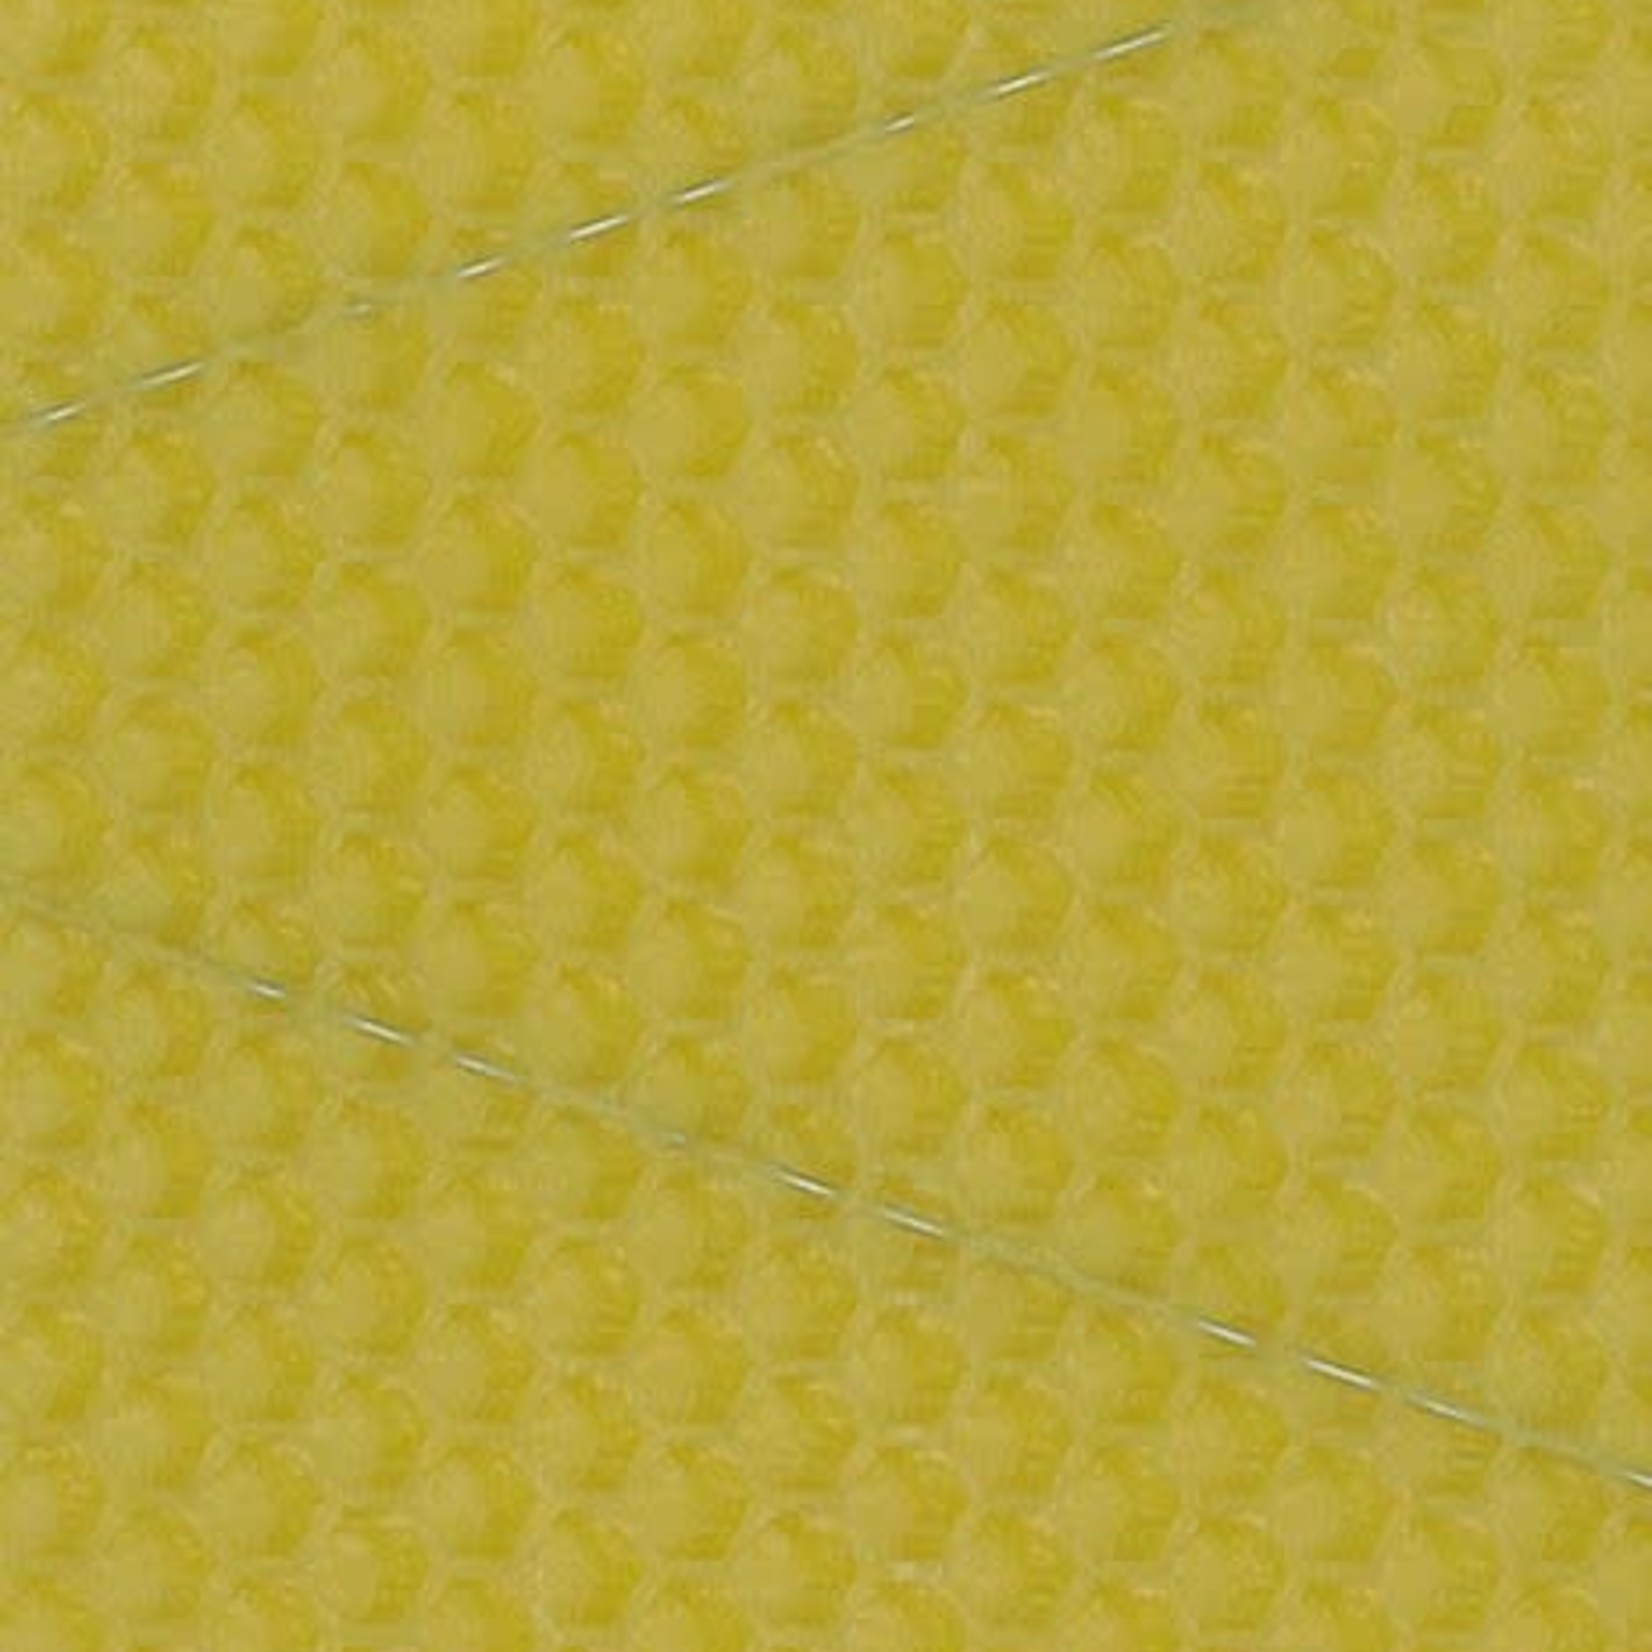 B.S Deep Wax Wired 10 - (Bee Keeping Equipment)